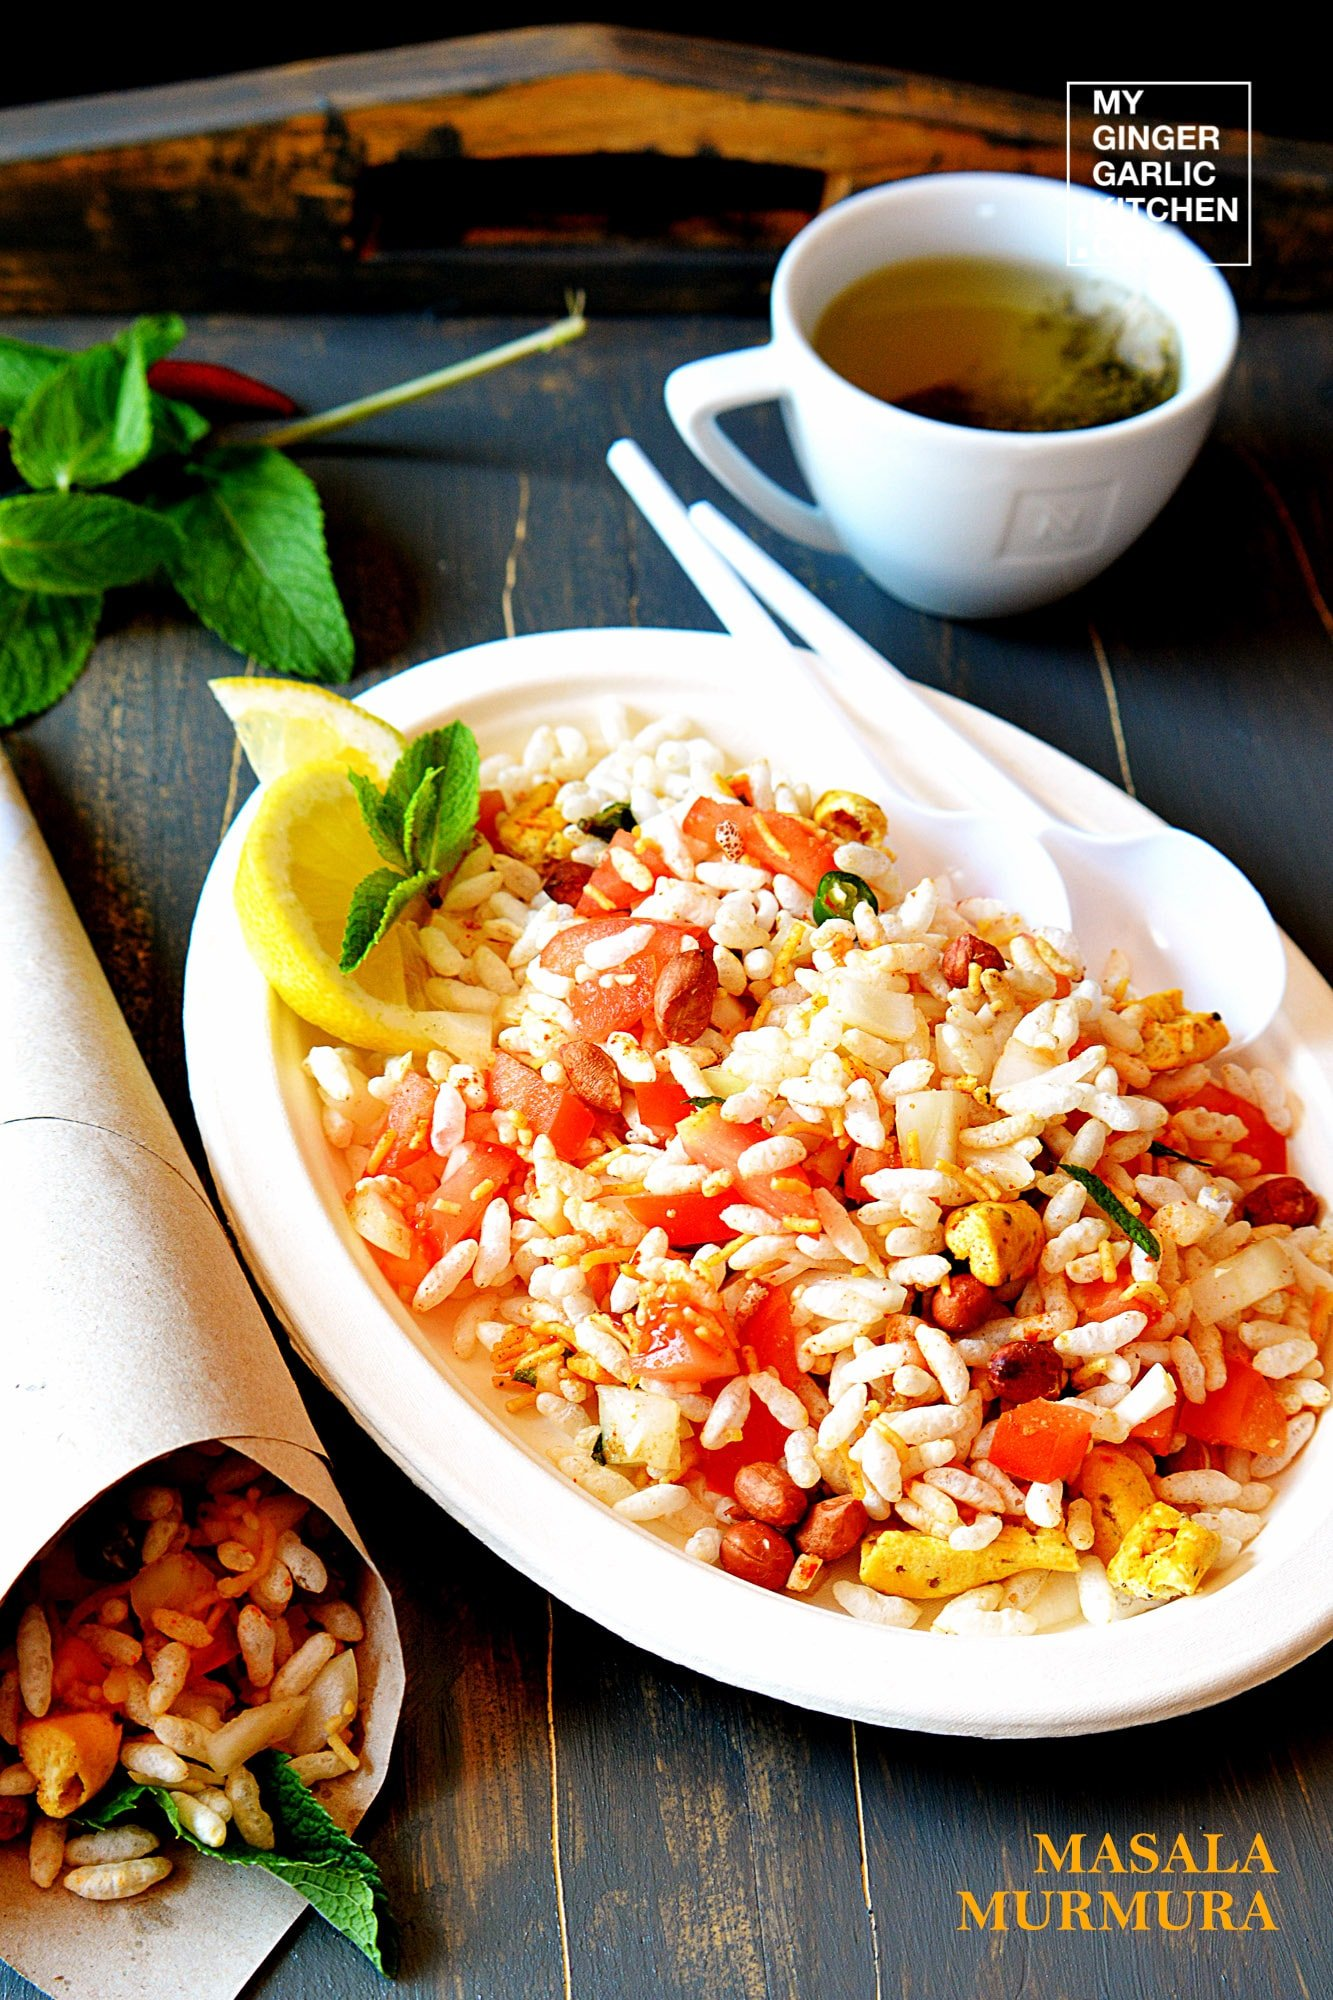 Image - recipe masala murmura anupama paliwal my ginger garlic kitchen 2